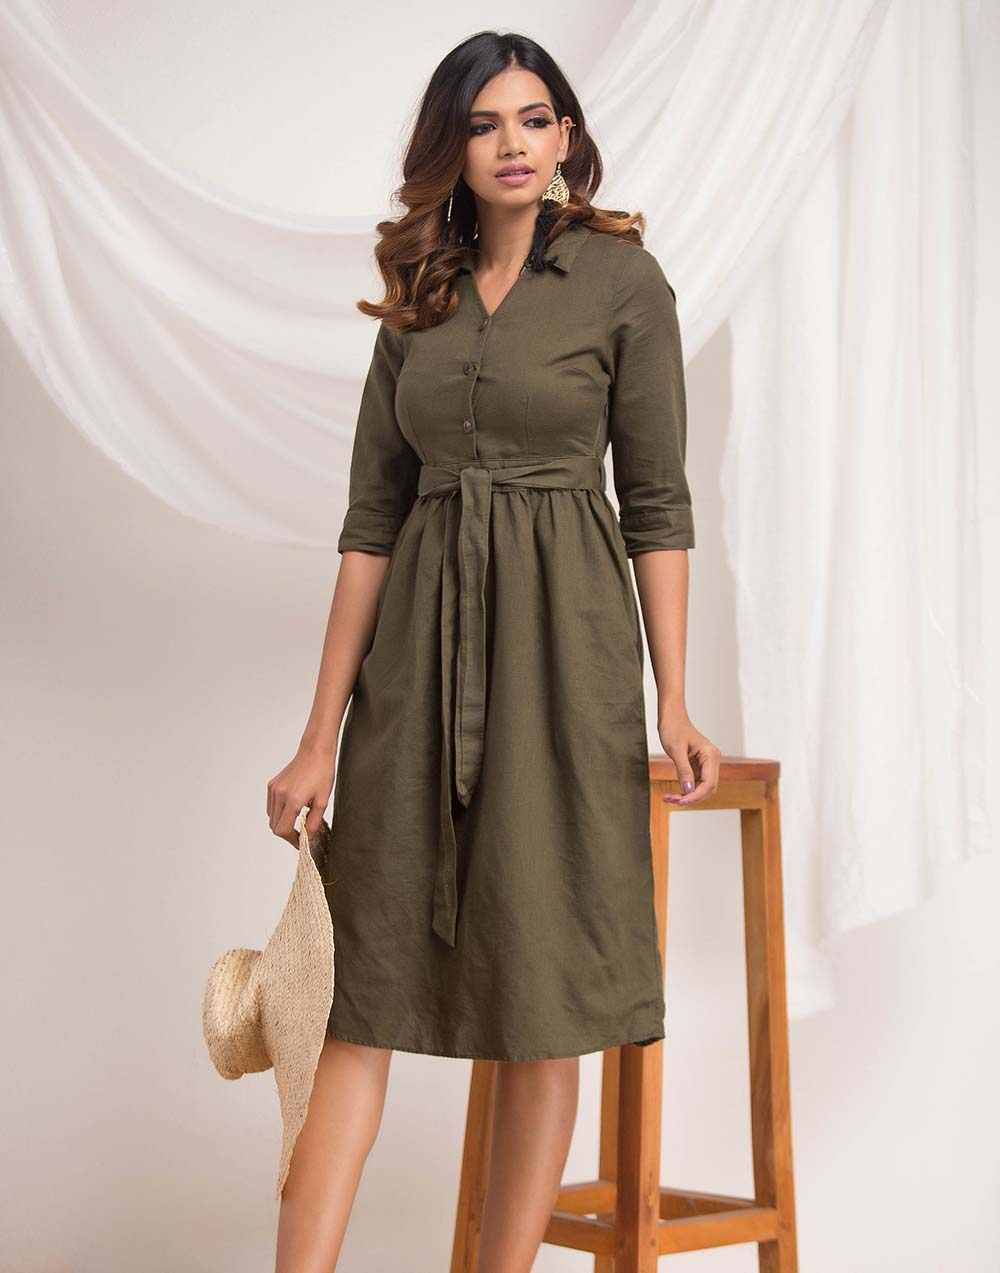 Midi Sketer Dress